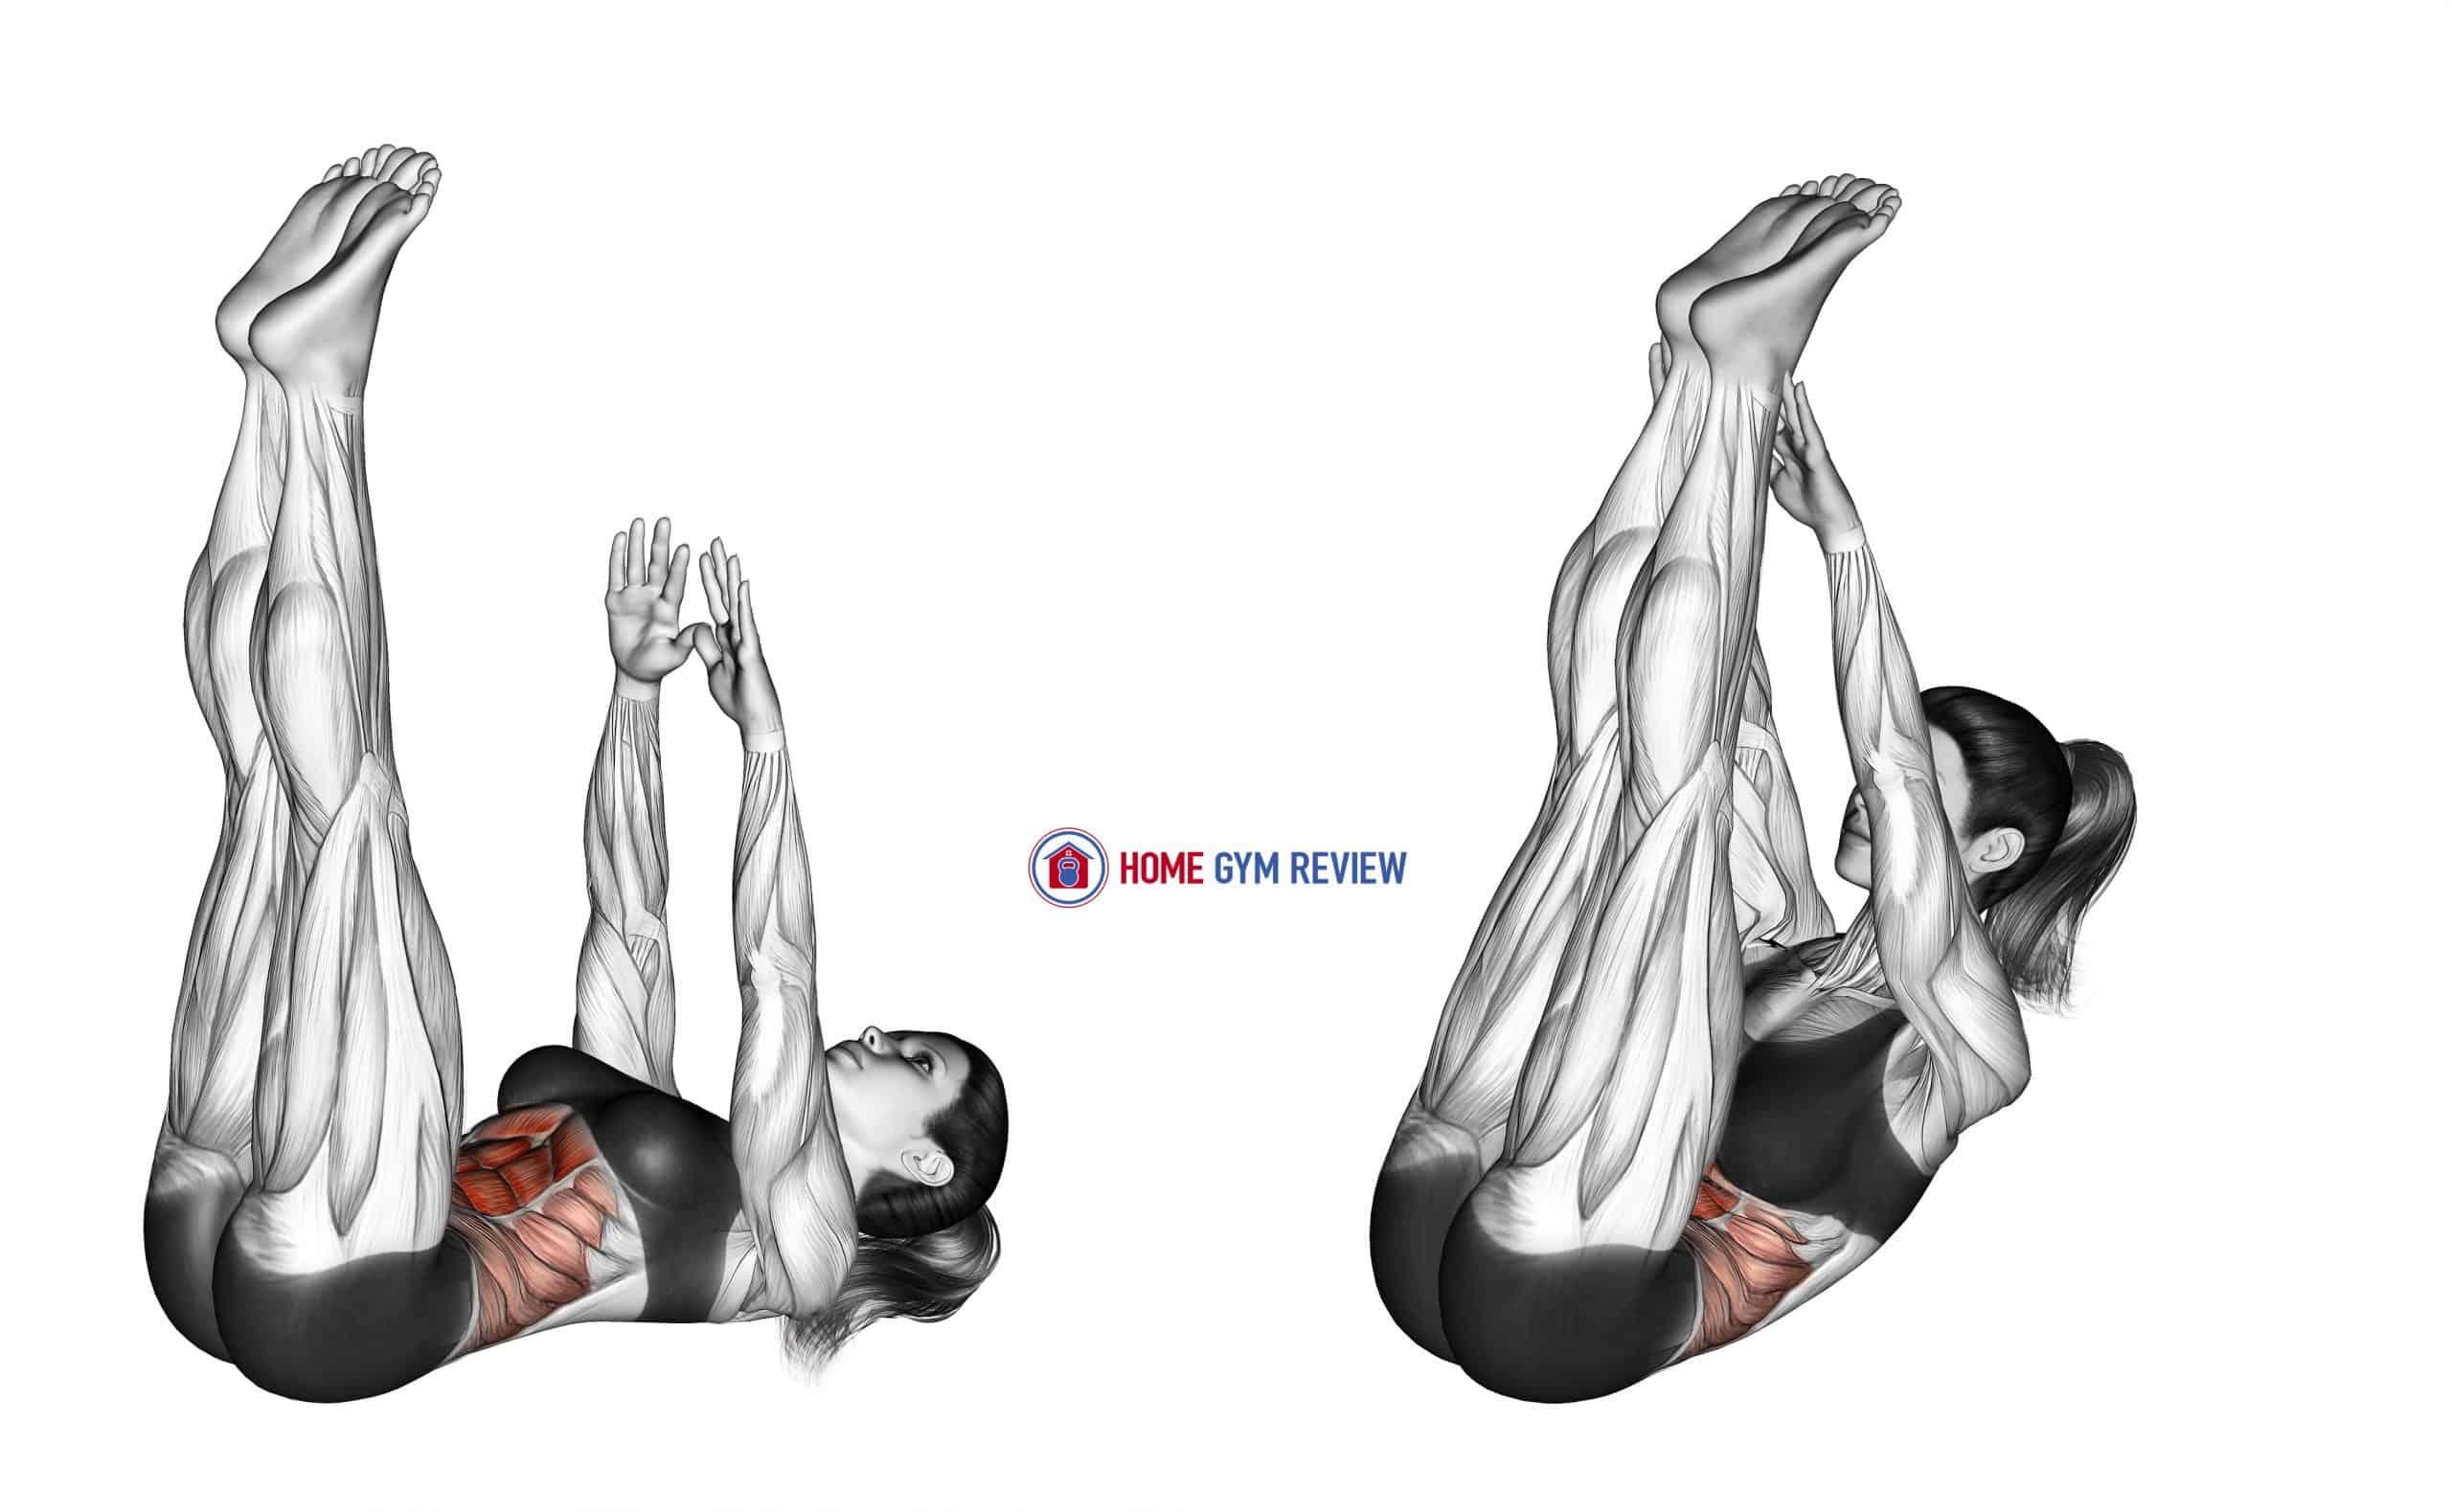 Crunch (straight leg-up)